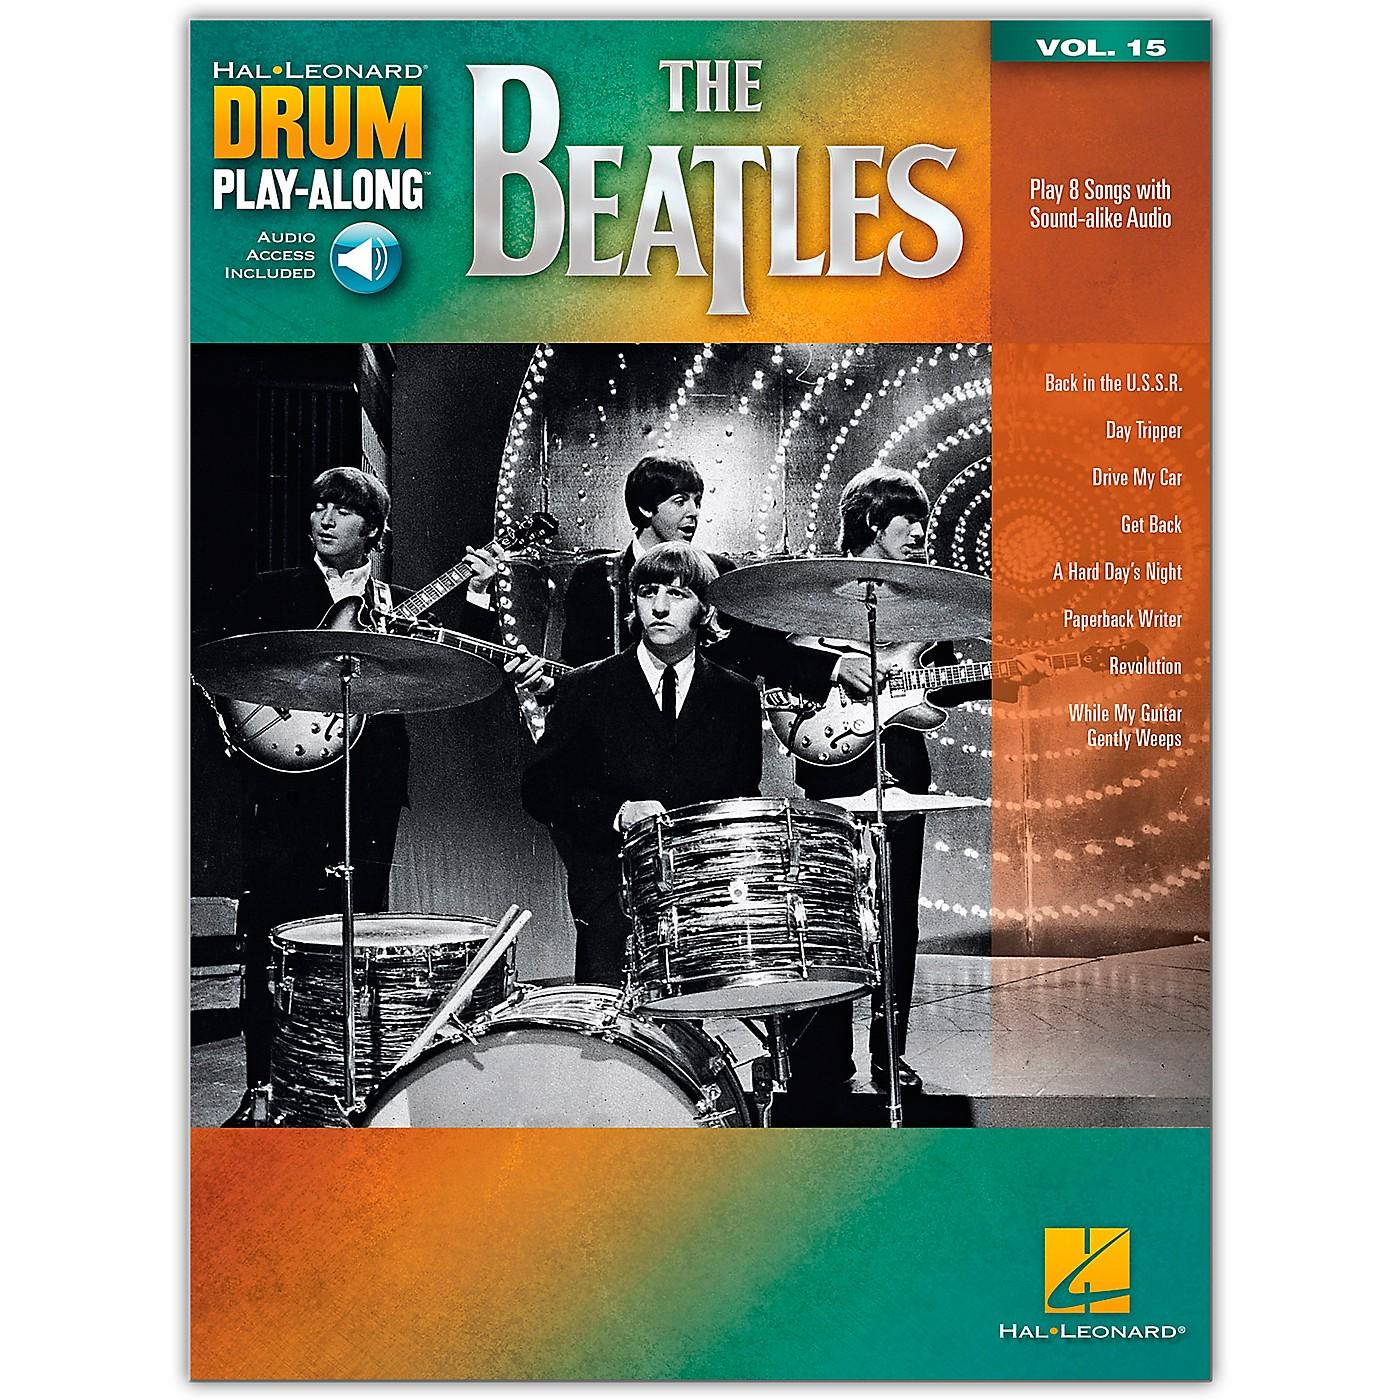 Hal Leonard The Beatles - Drum Play-Along Volume 15 thumbnail